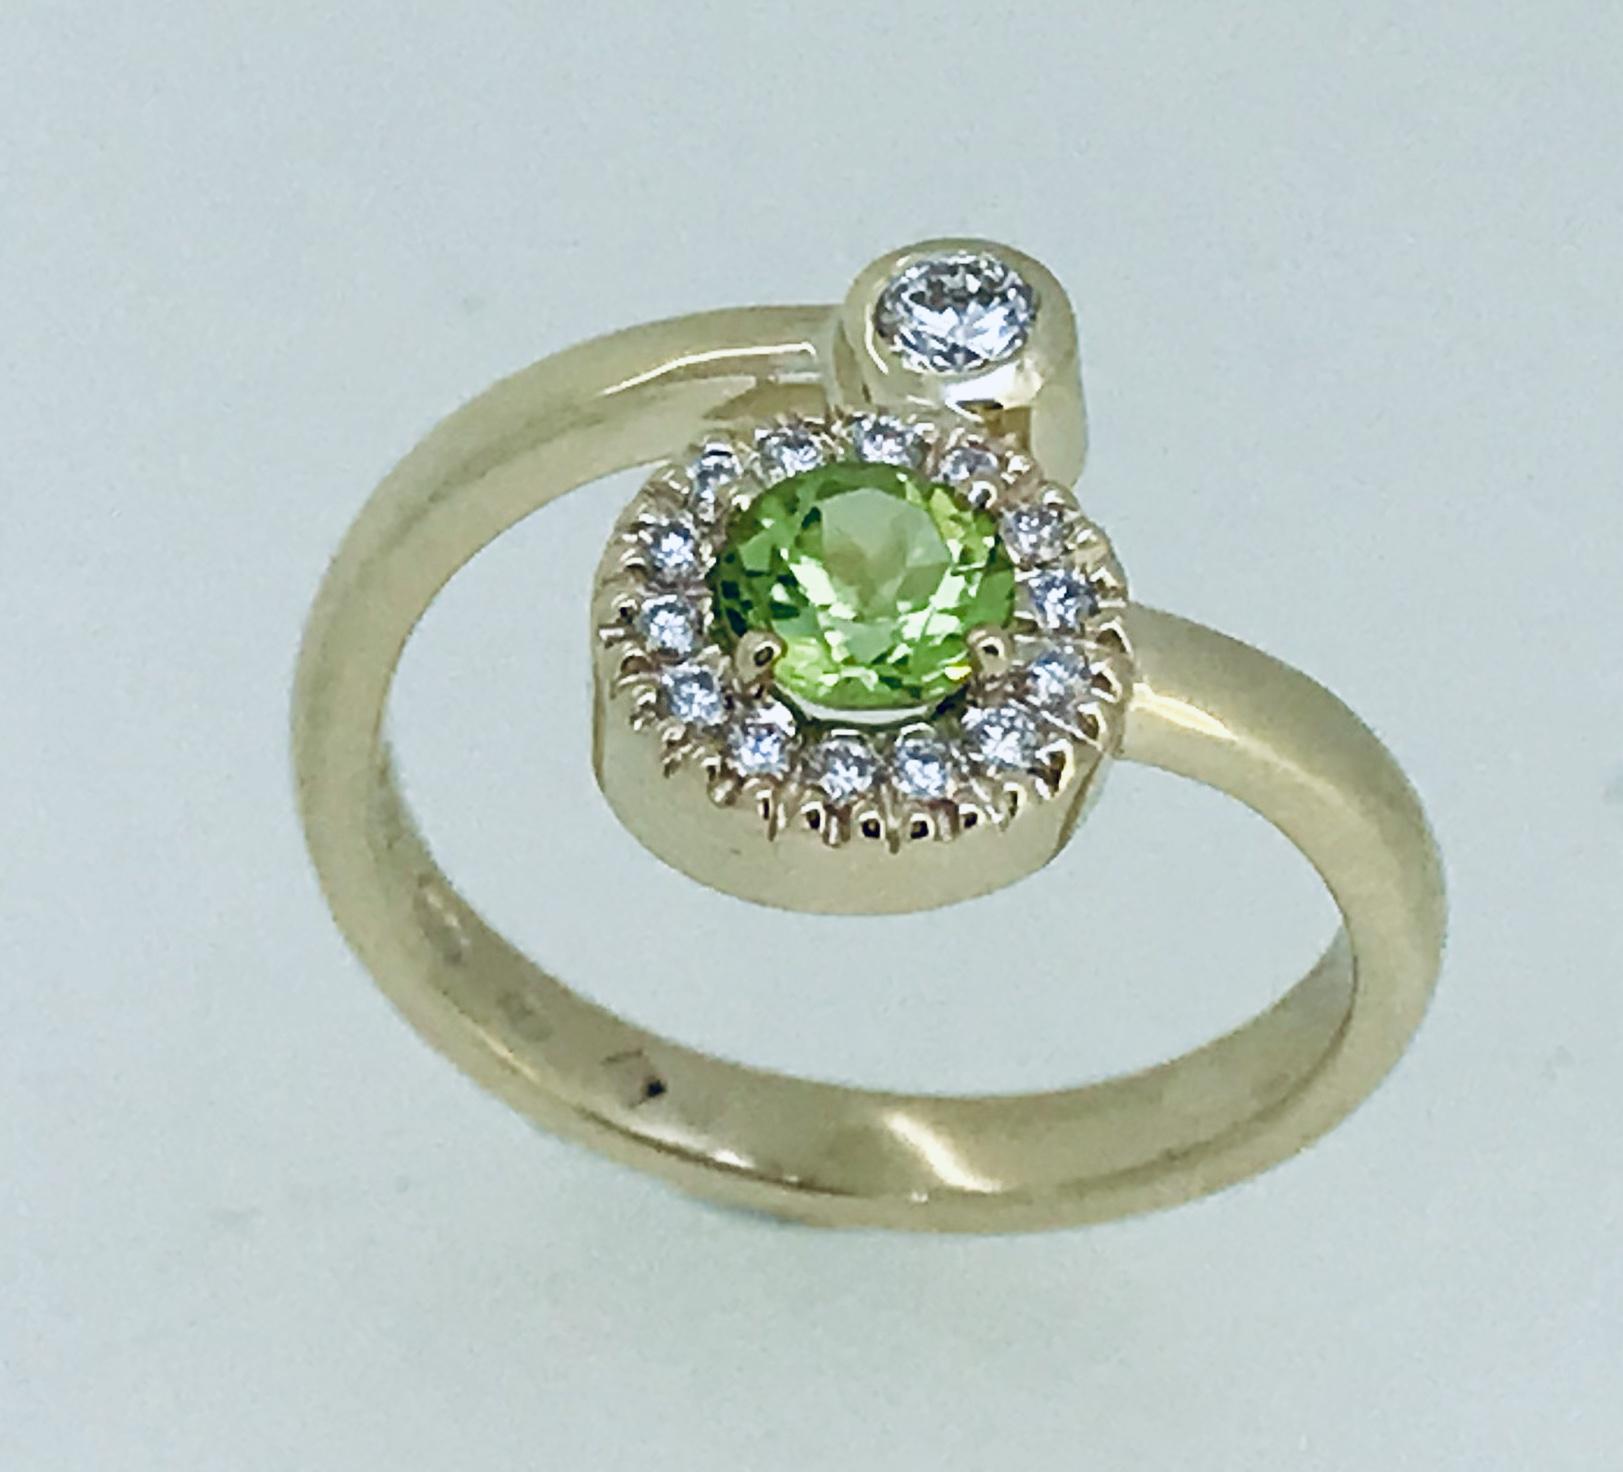 Peridot and Diamond August Birthstone Ring